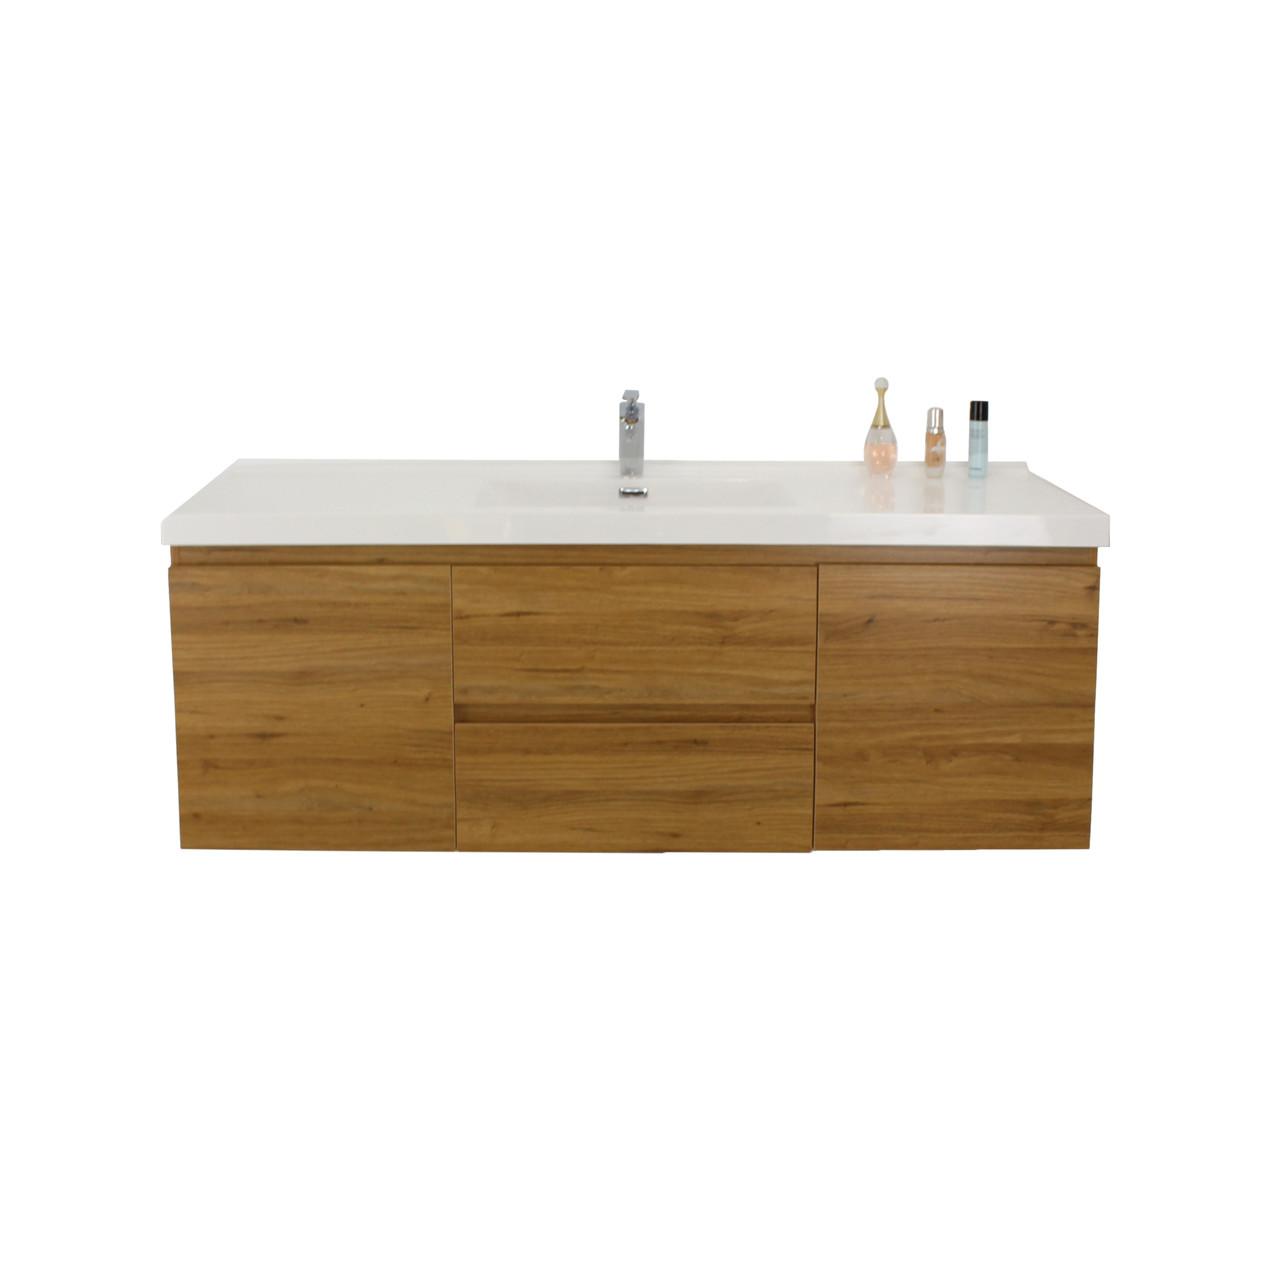 Bohemia 60 Single Sink Black Wall Mounted Modern Bathroom Vanity With Reinforced Acrylic Sink Tona Bathroom Vanity